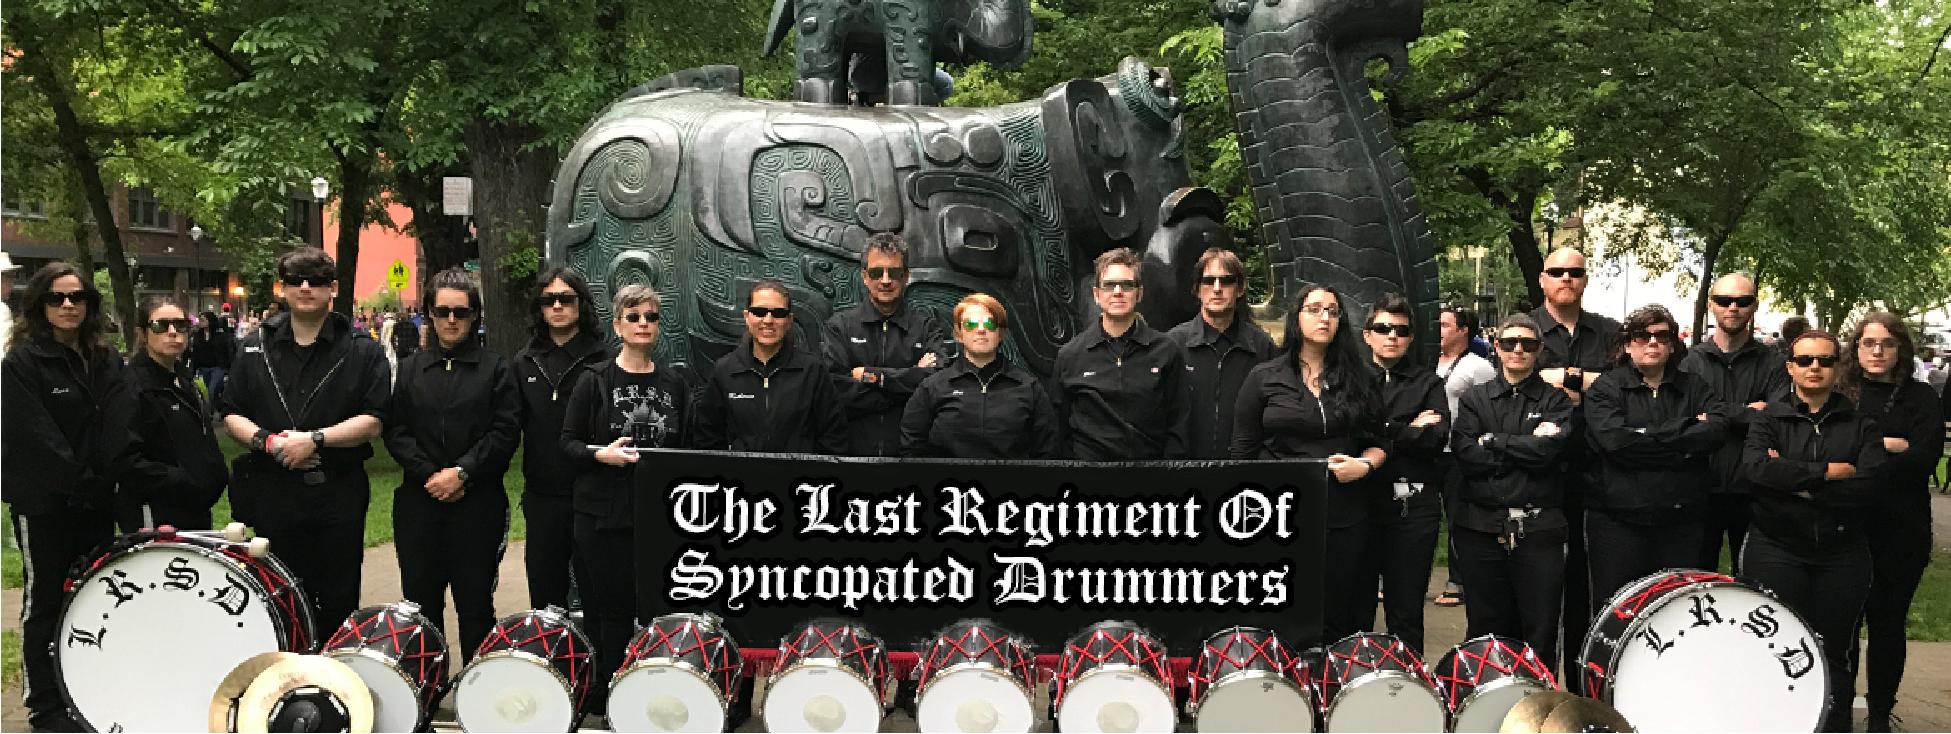 The last regiment band.png